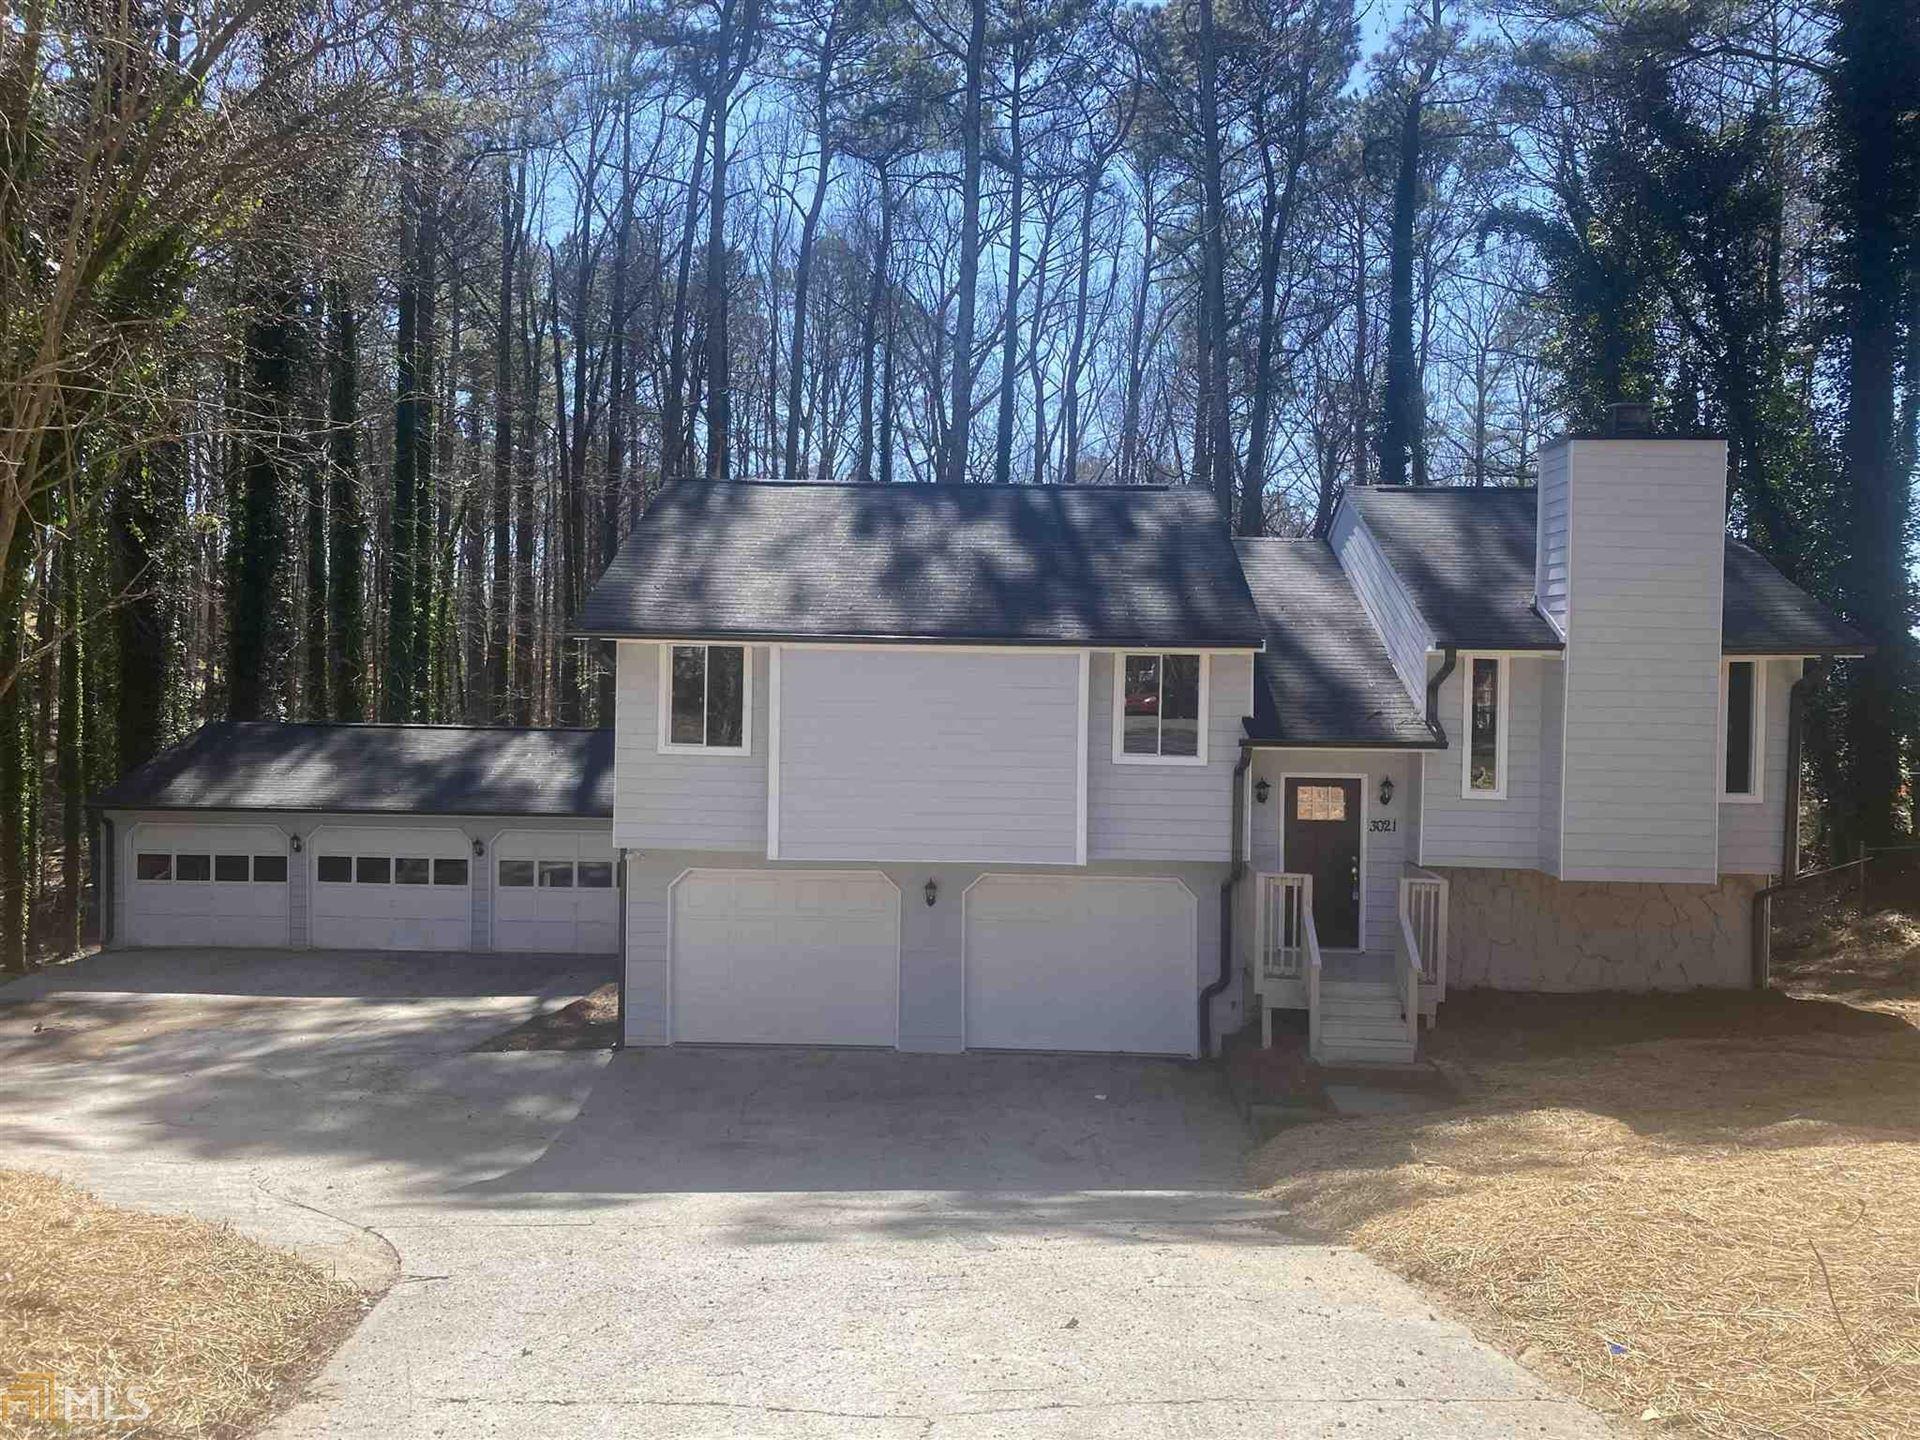 3021 Munson Ct, Snellville, GA 30039 - #: 8938602